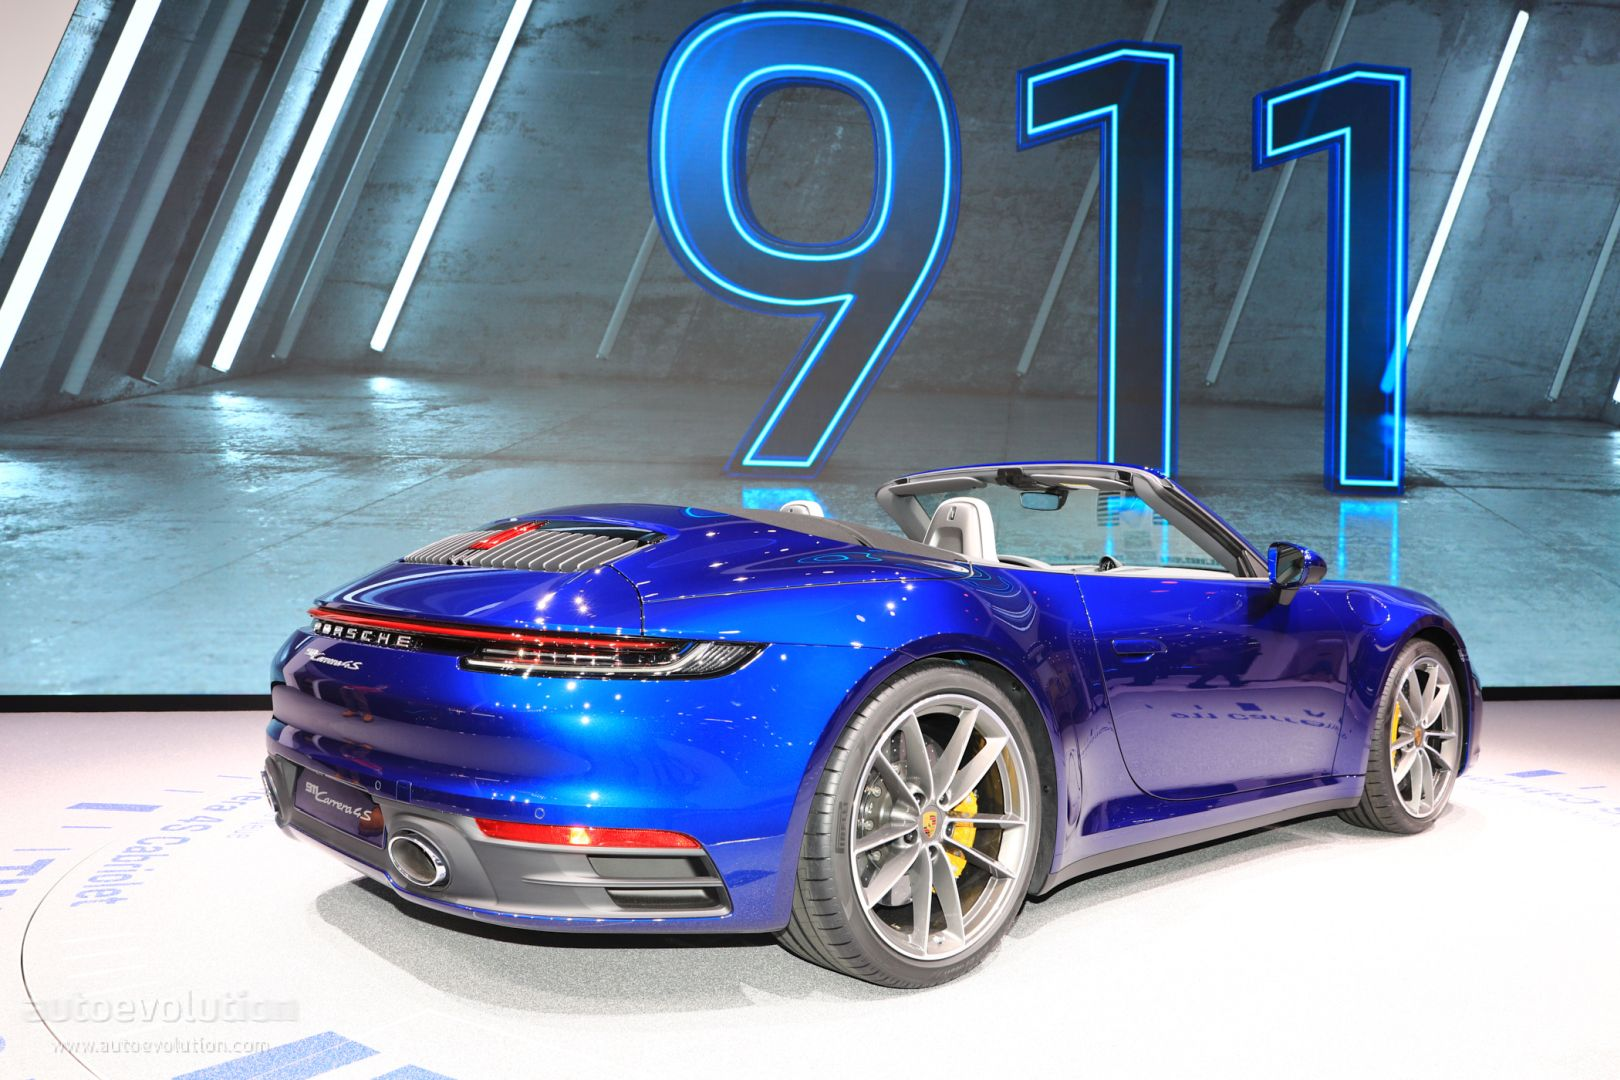 Gentian Blue 2020 Porsche 911 Cabriolet Looks Retro in